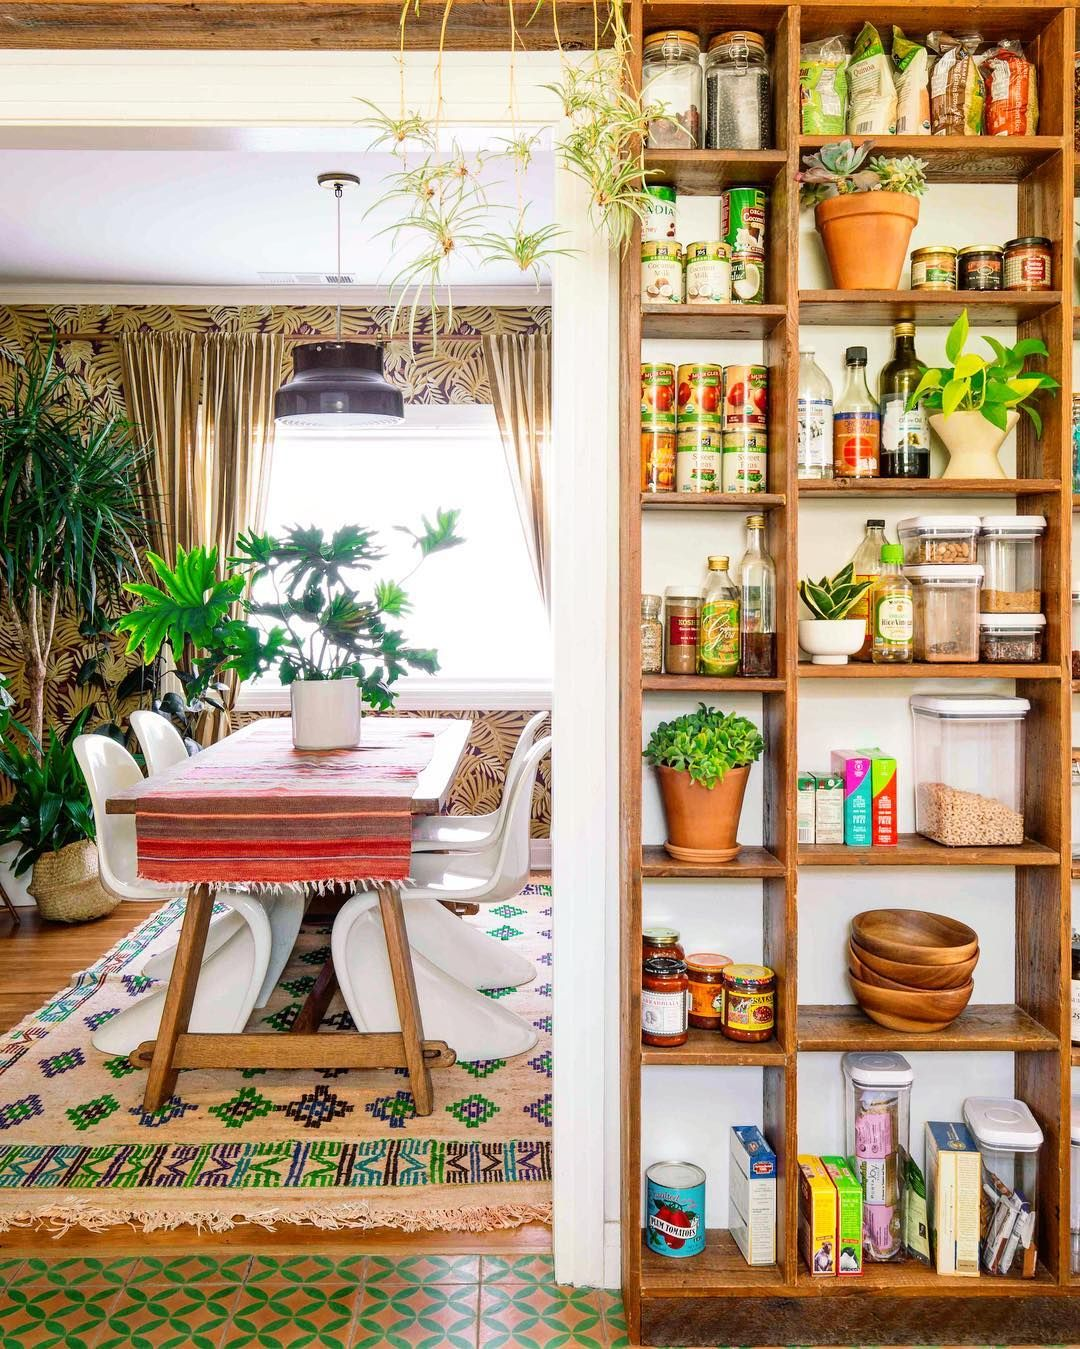 Hippie Kitchen Decor: Dining Boho Style @justinablakeney Home